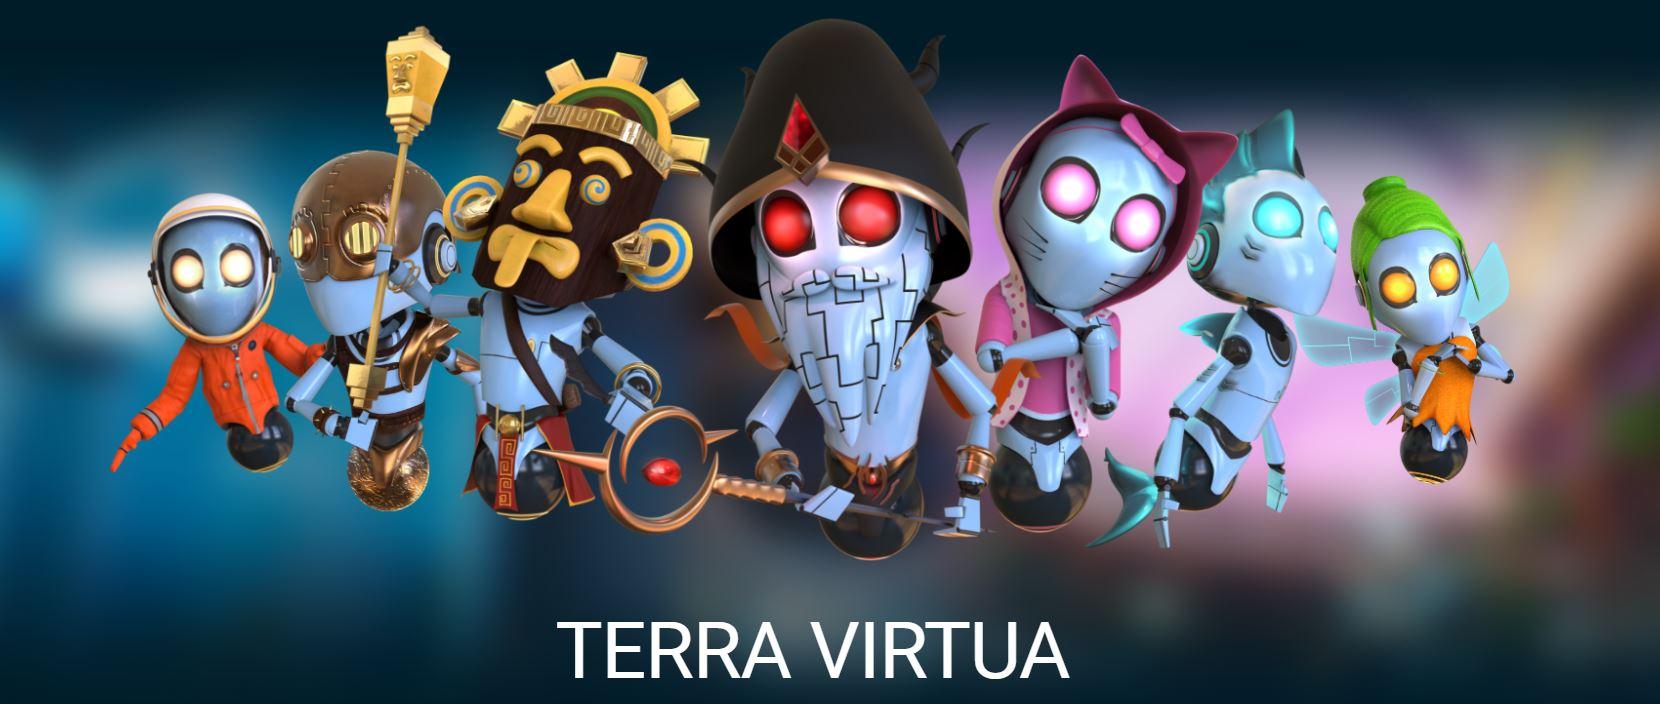 Terra Virtua Marketplace